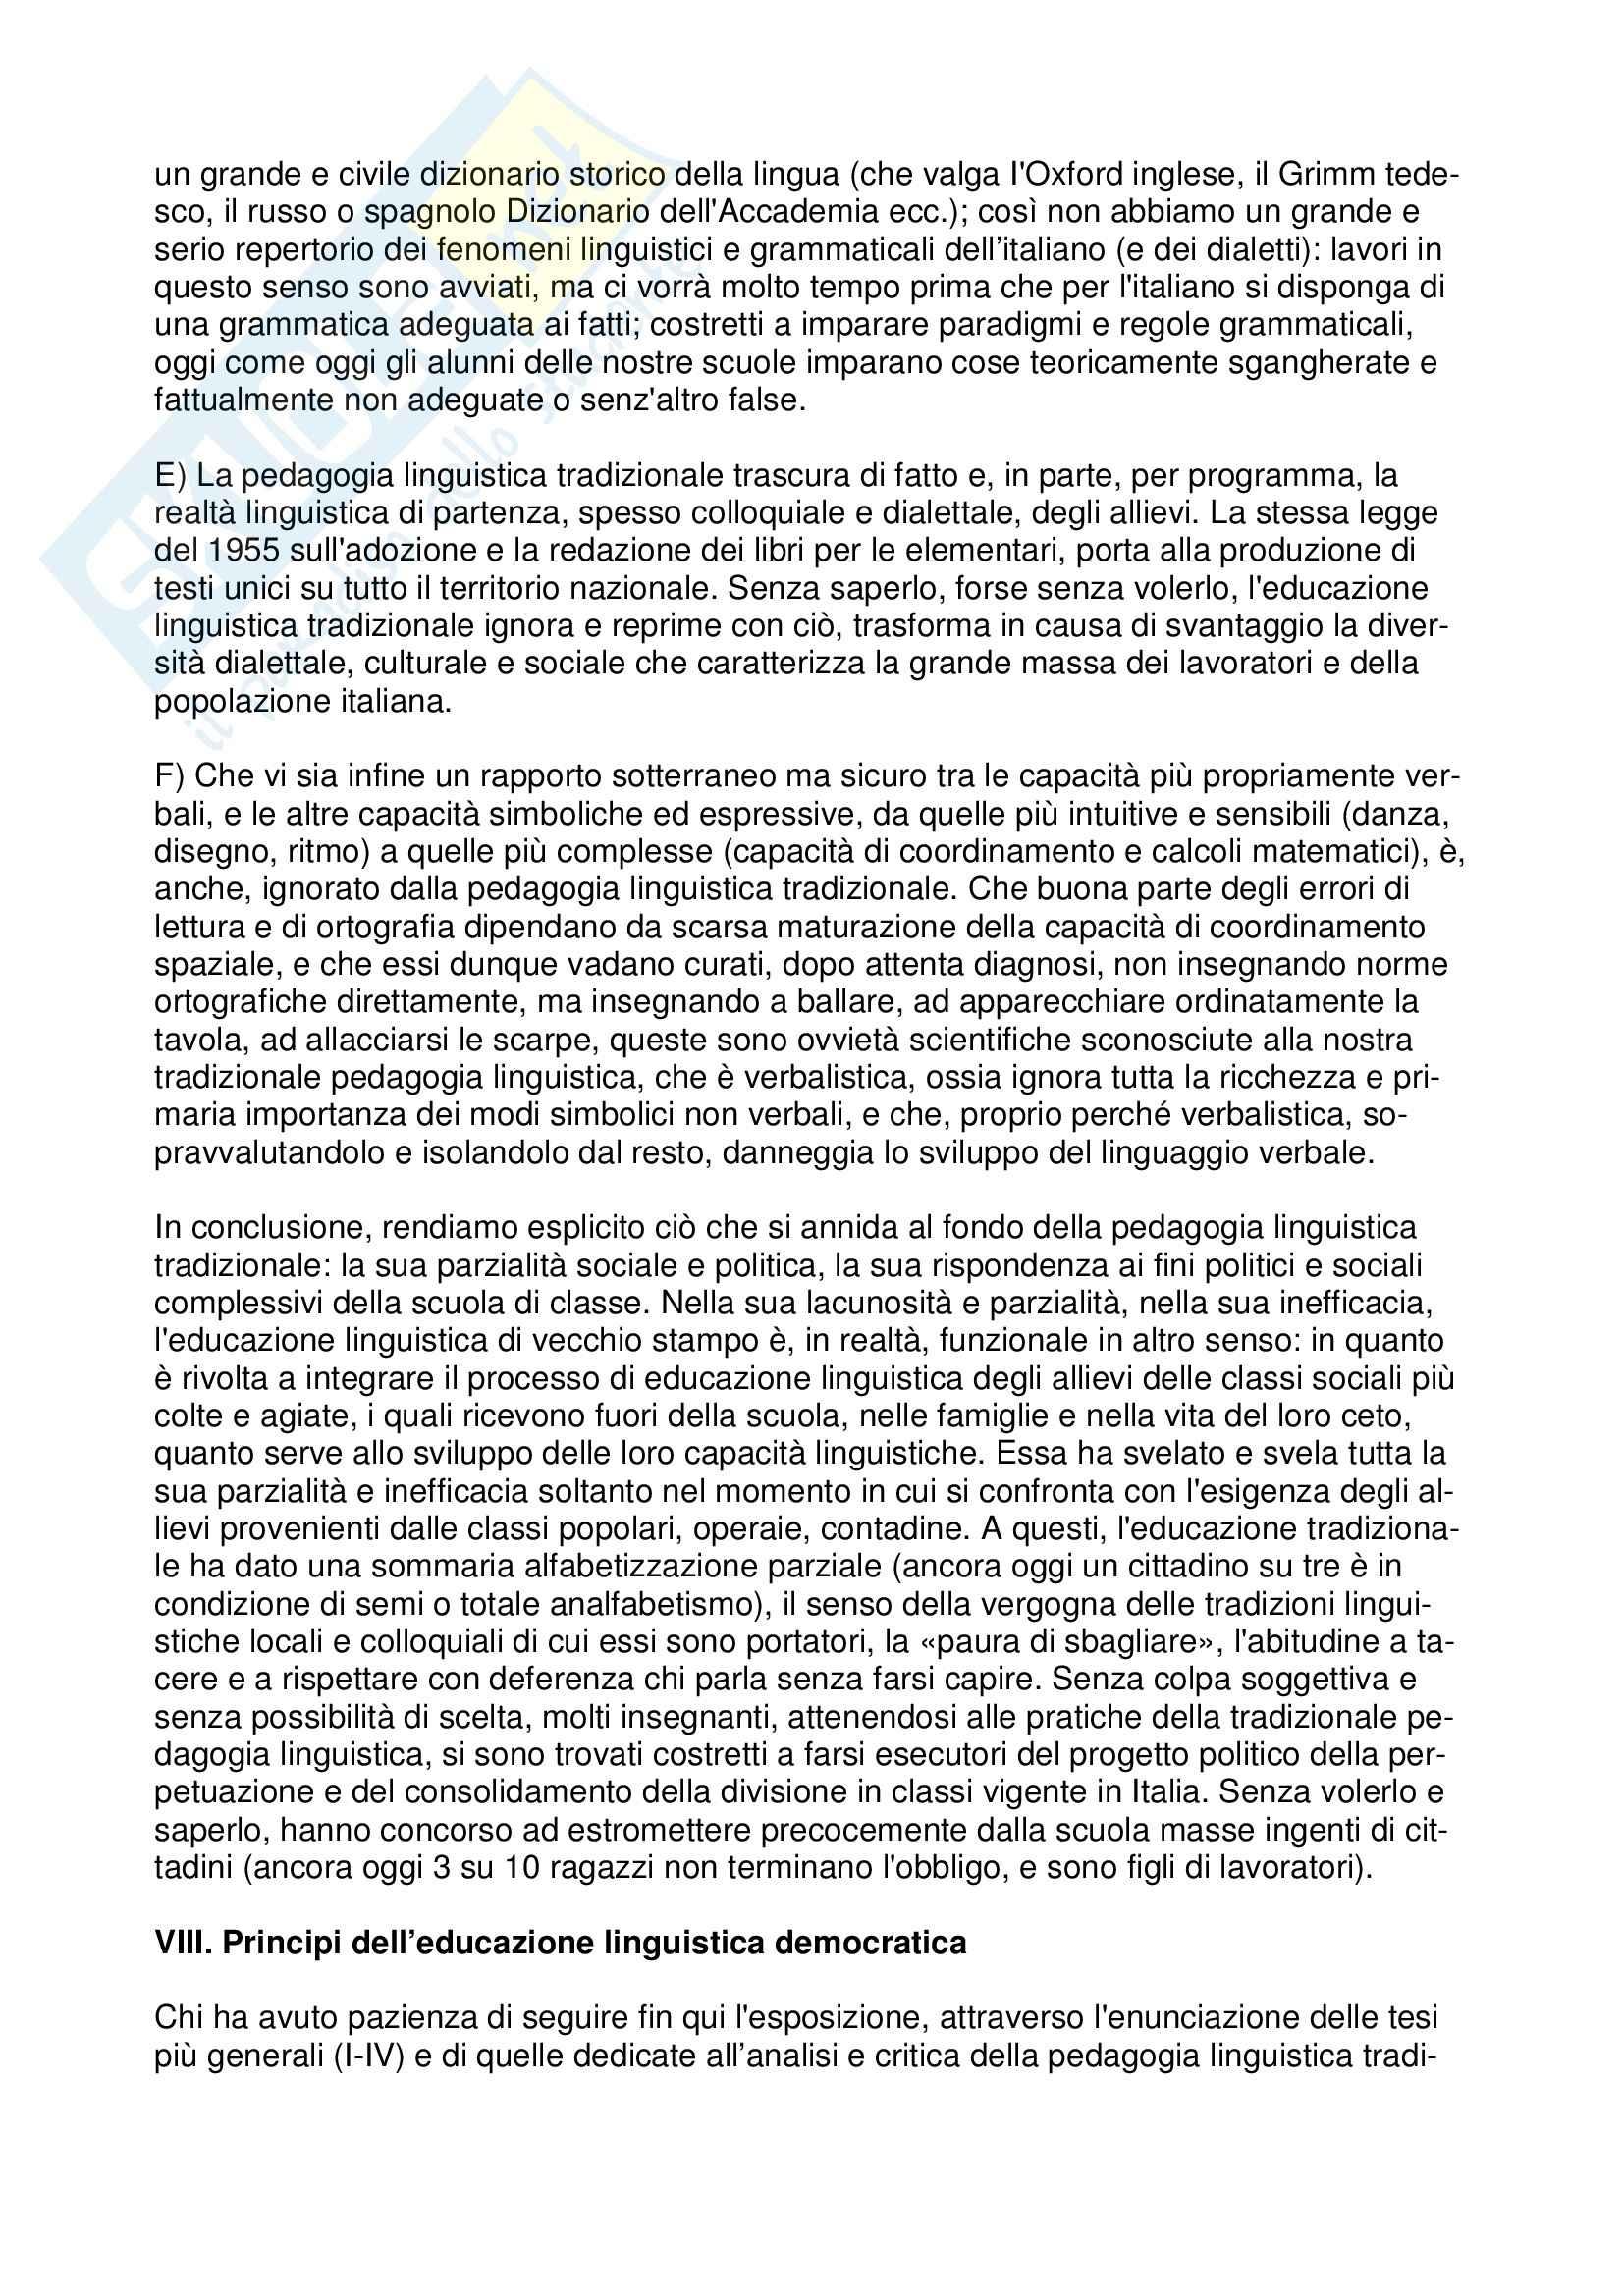 10 tesi per l'educazione linguistica democratica Pag. 6